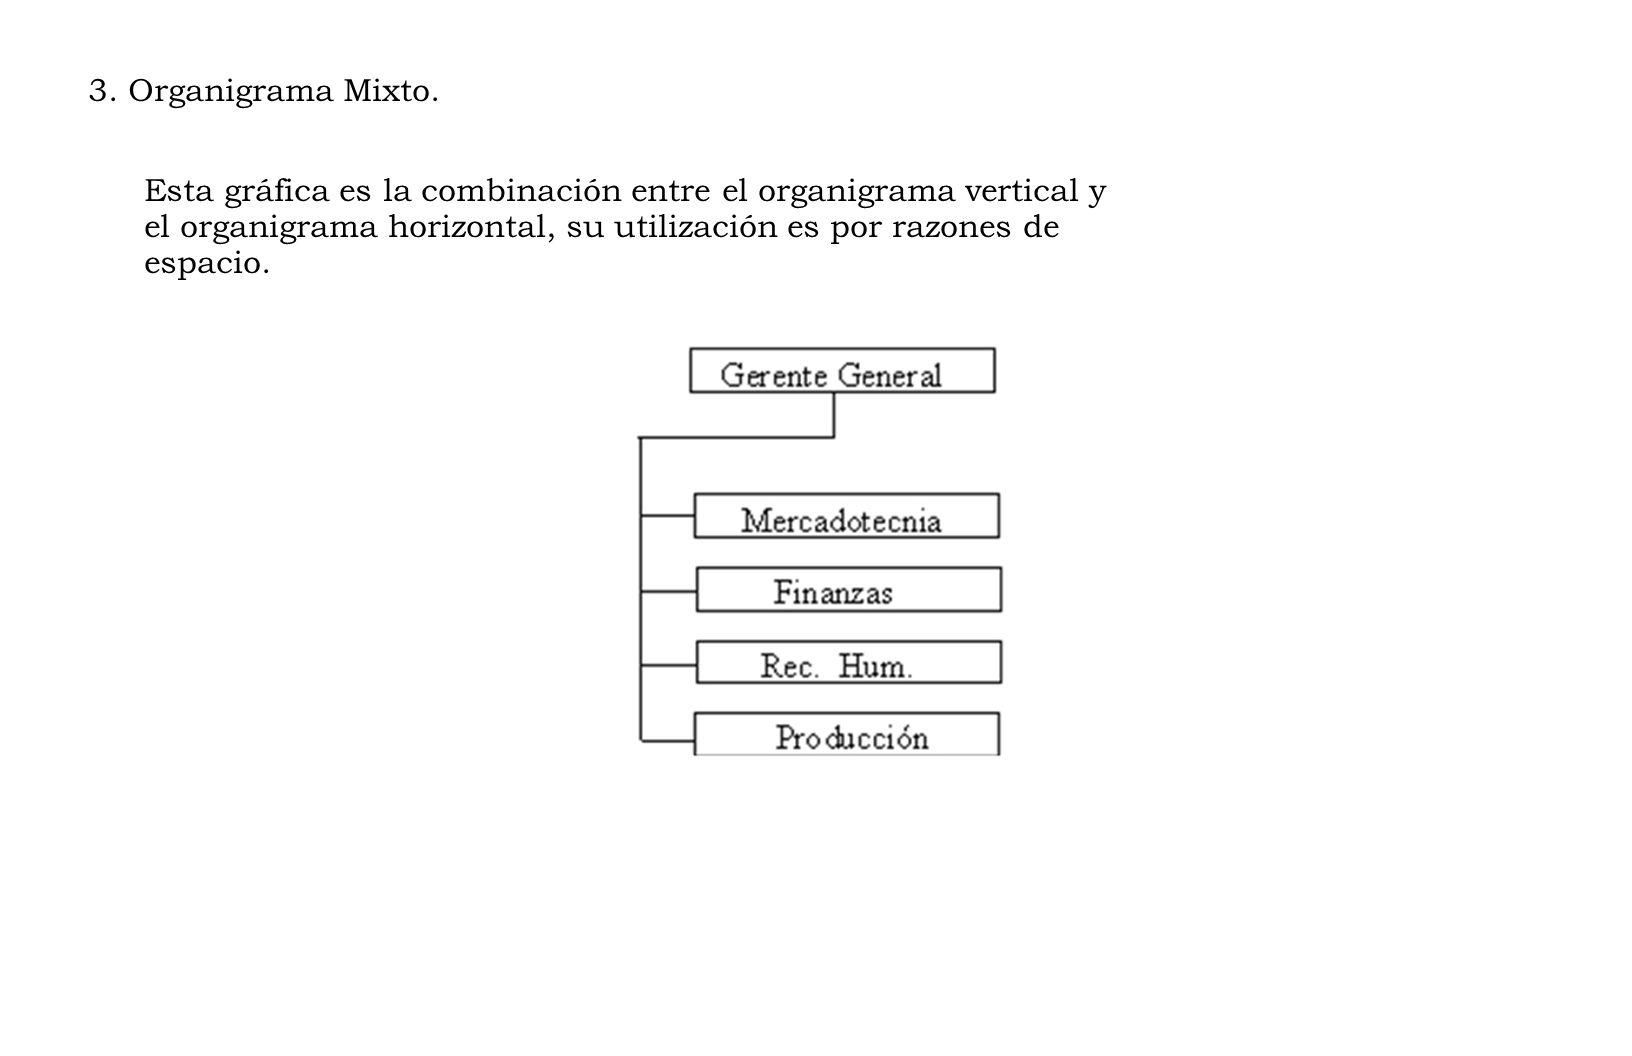 3. Organigrama Mixto.